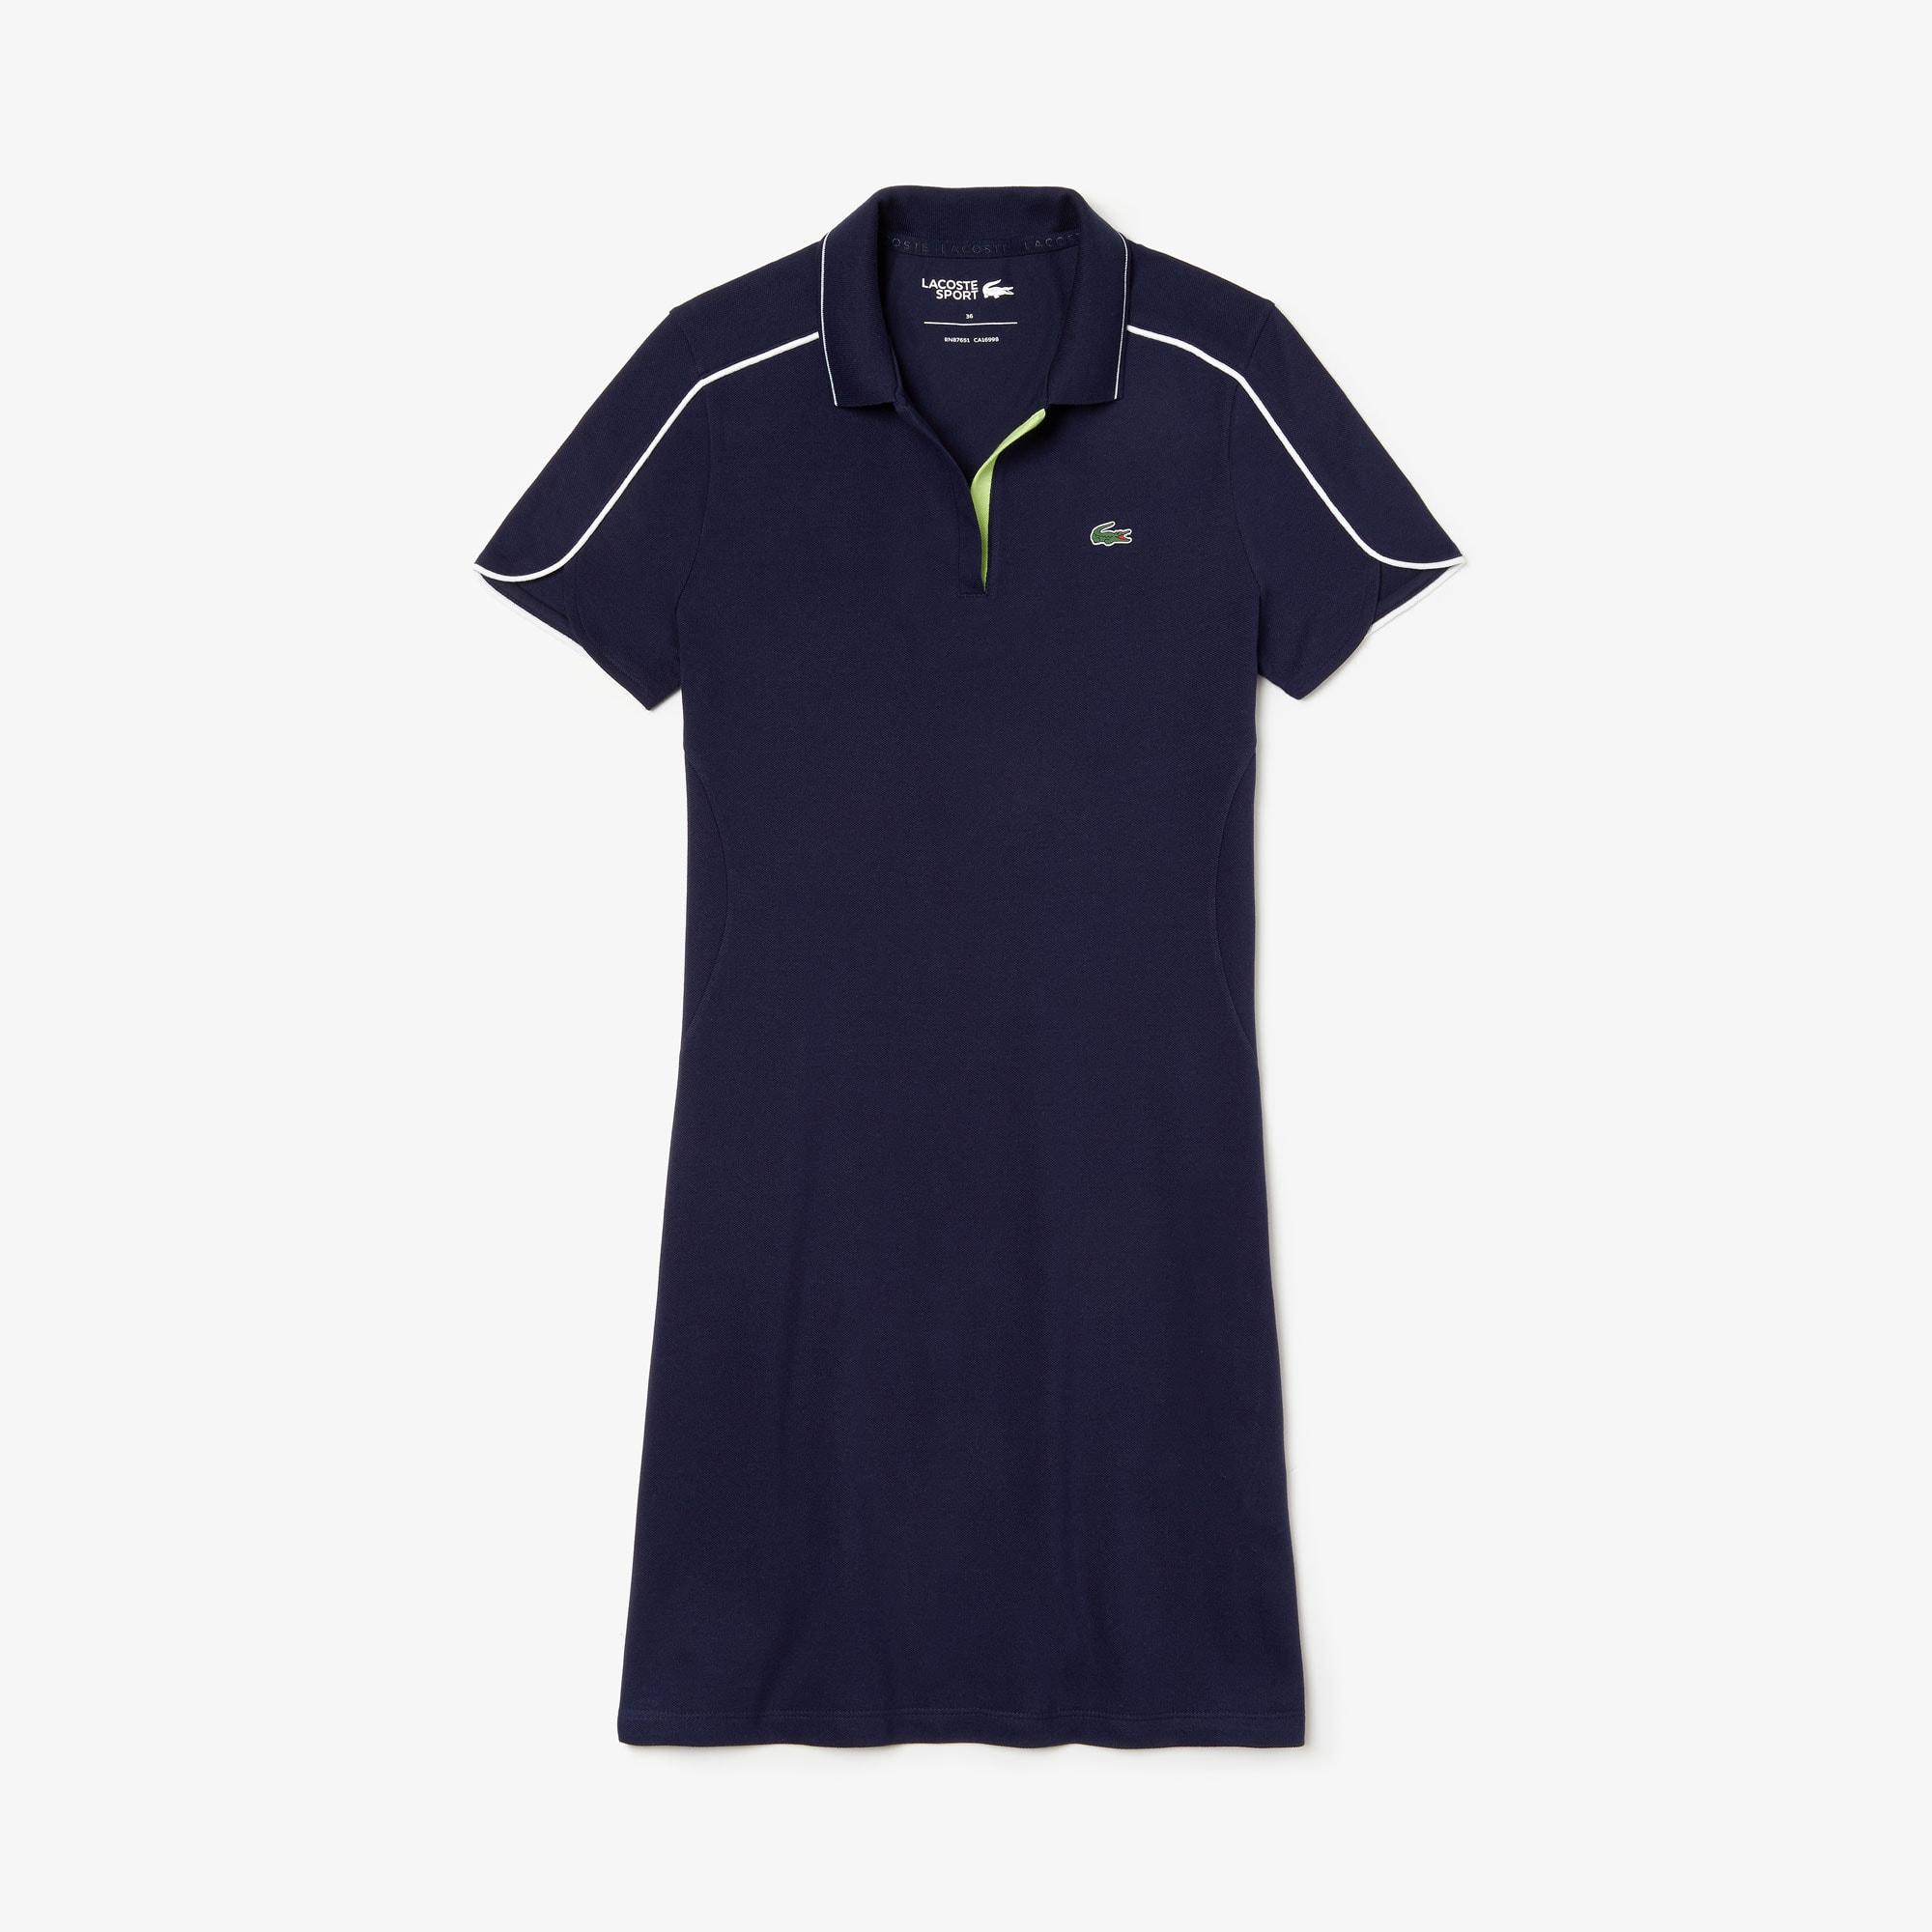 newest collection 388bb 33657 Damen LACOSTE SPORT Golf-Polokleid mit V-Ausschnitt